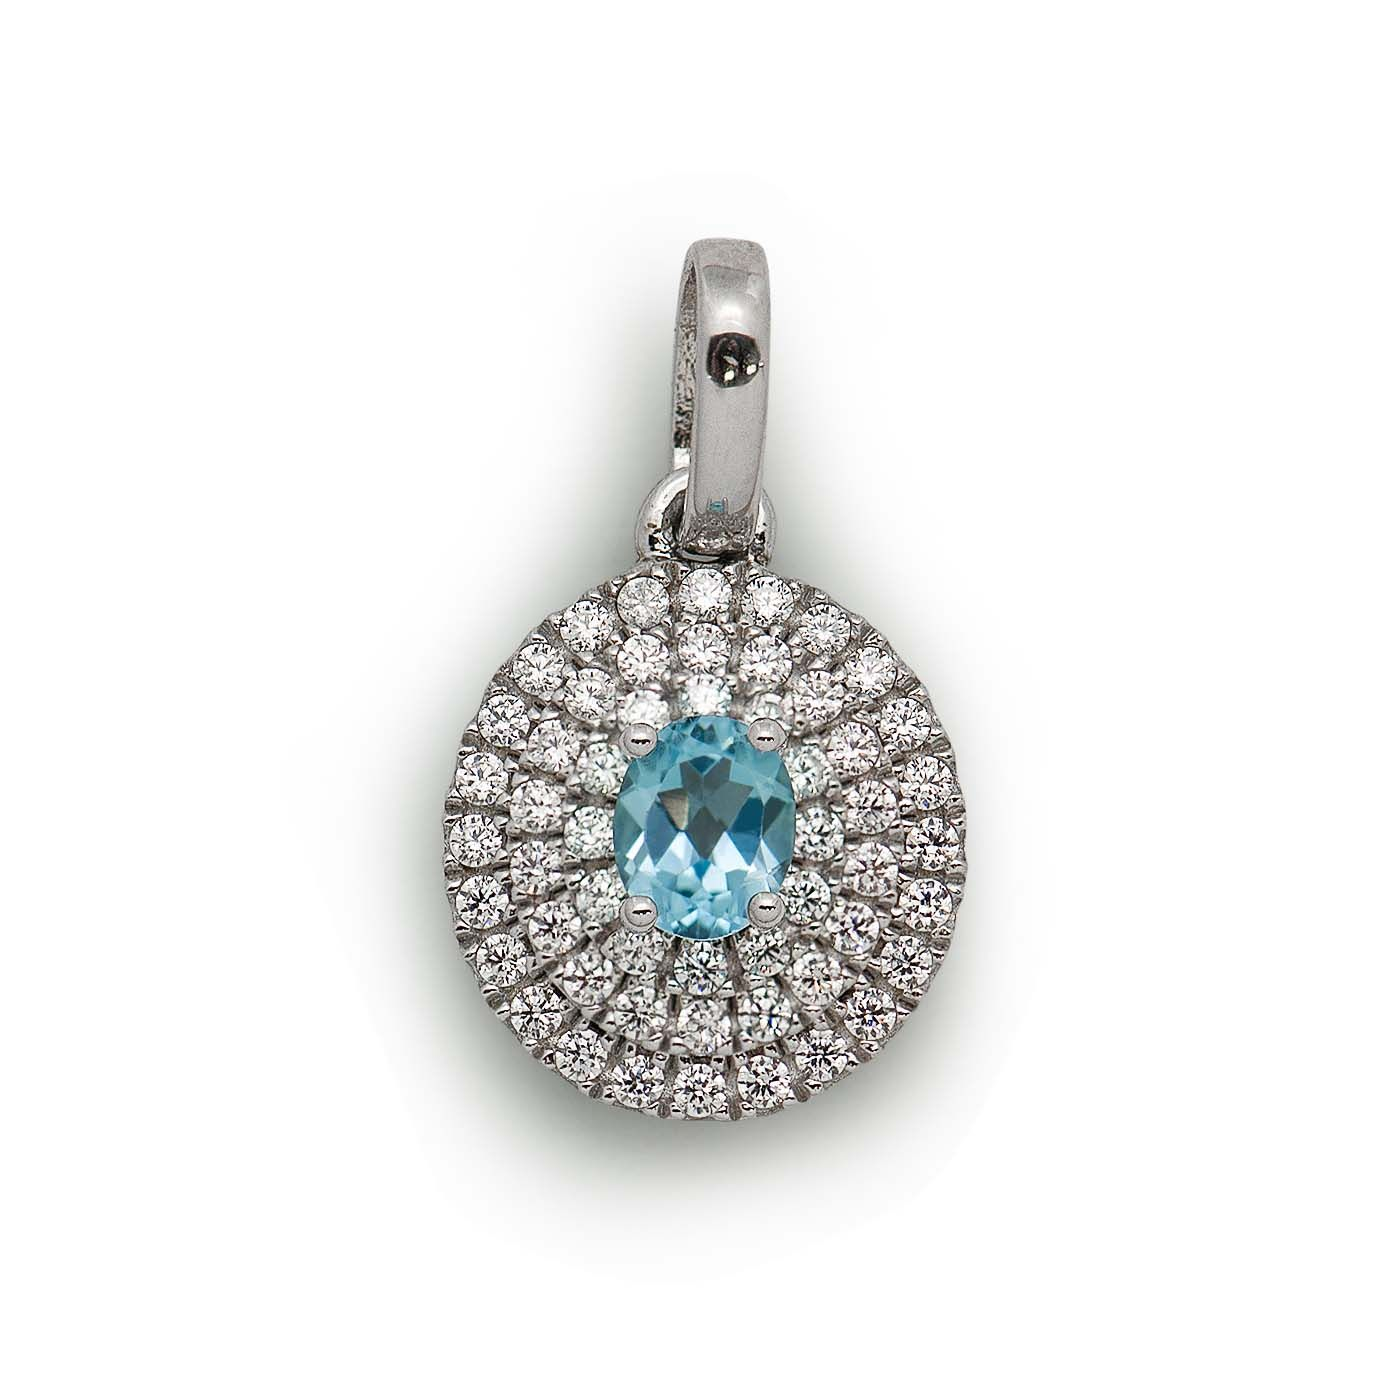 Ct oval swiss blue topaz sterling silver elegant royal